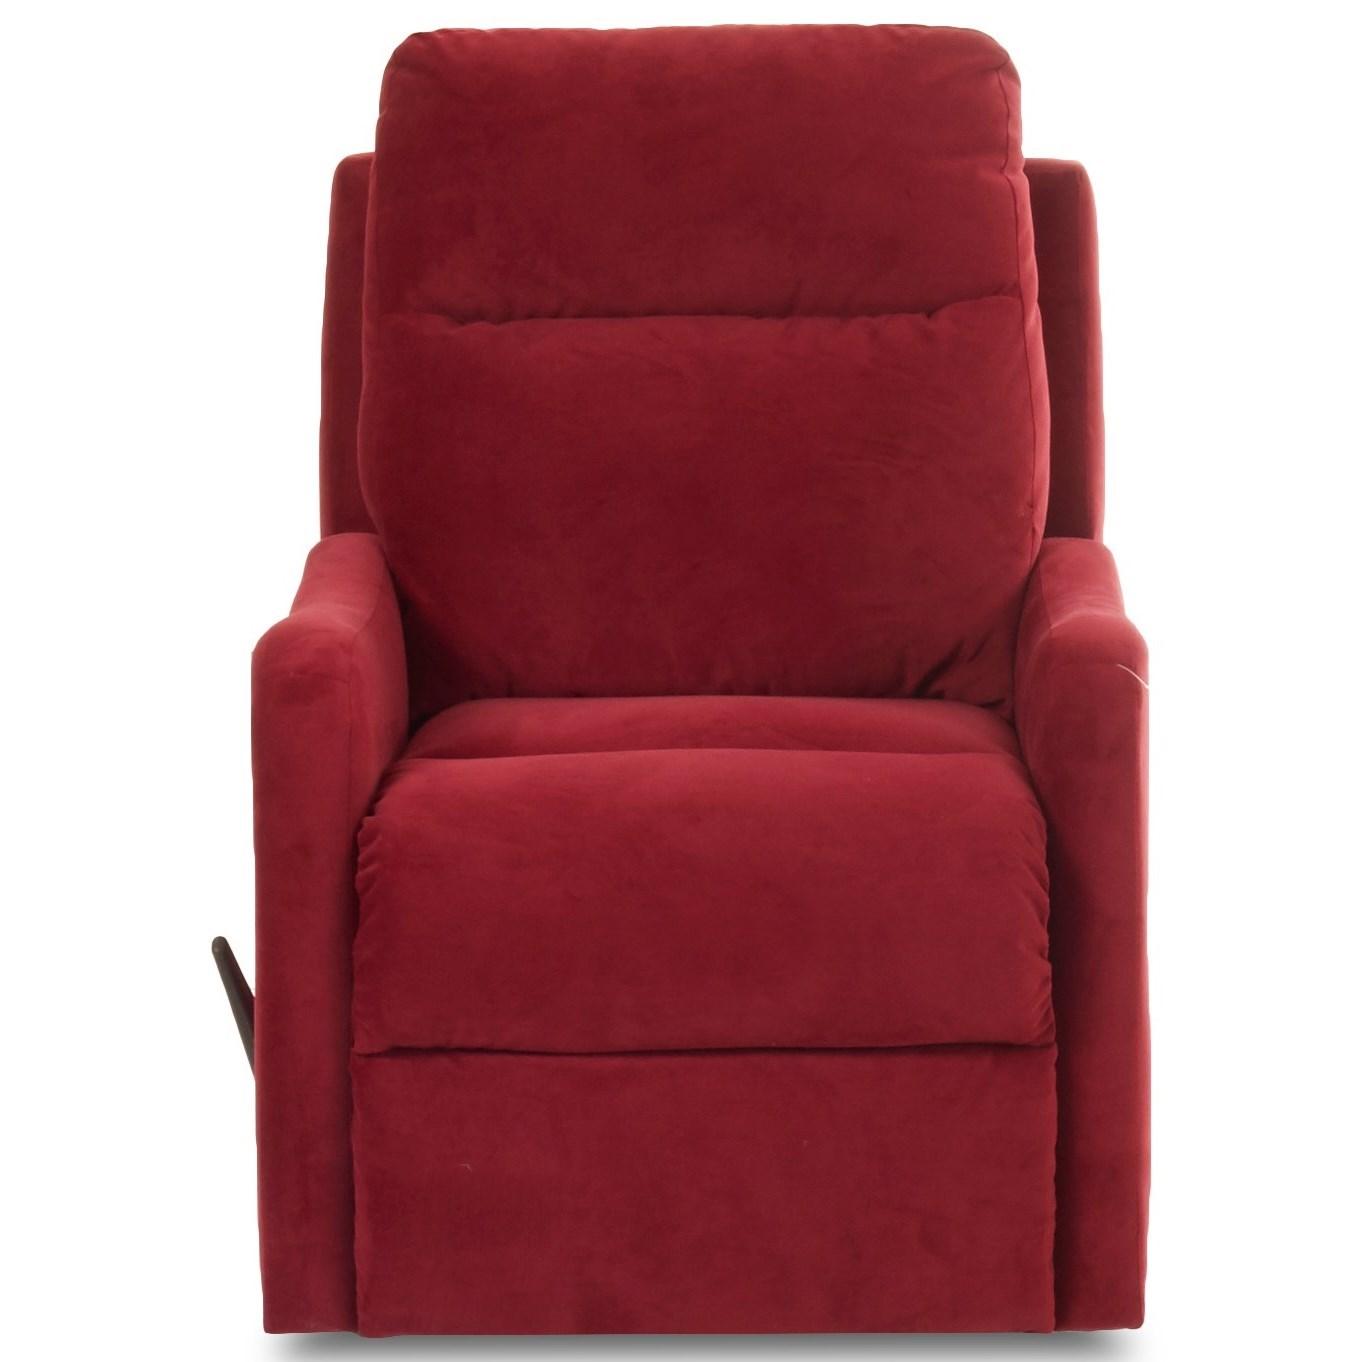 Klaussner Tacoma Reclining Chair - Item Number: 91803H RC-Tina Scarlet